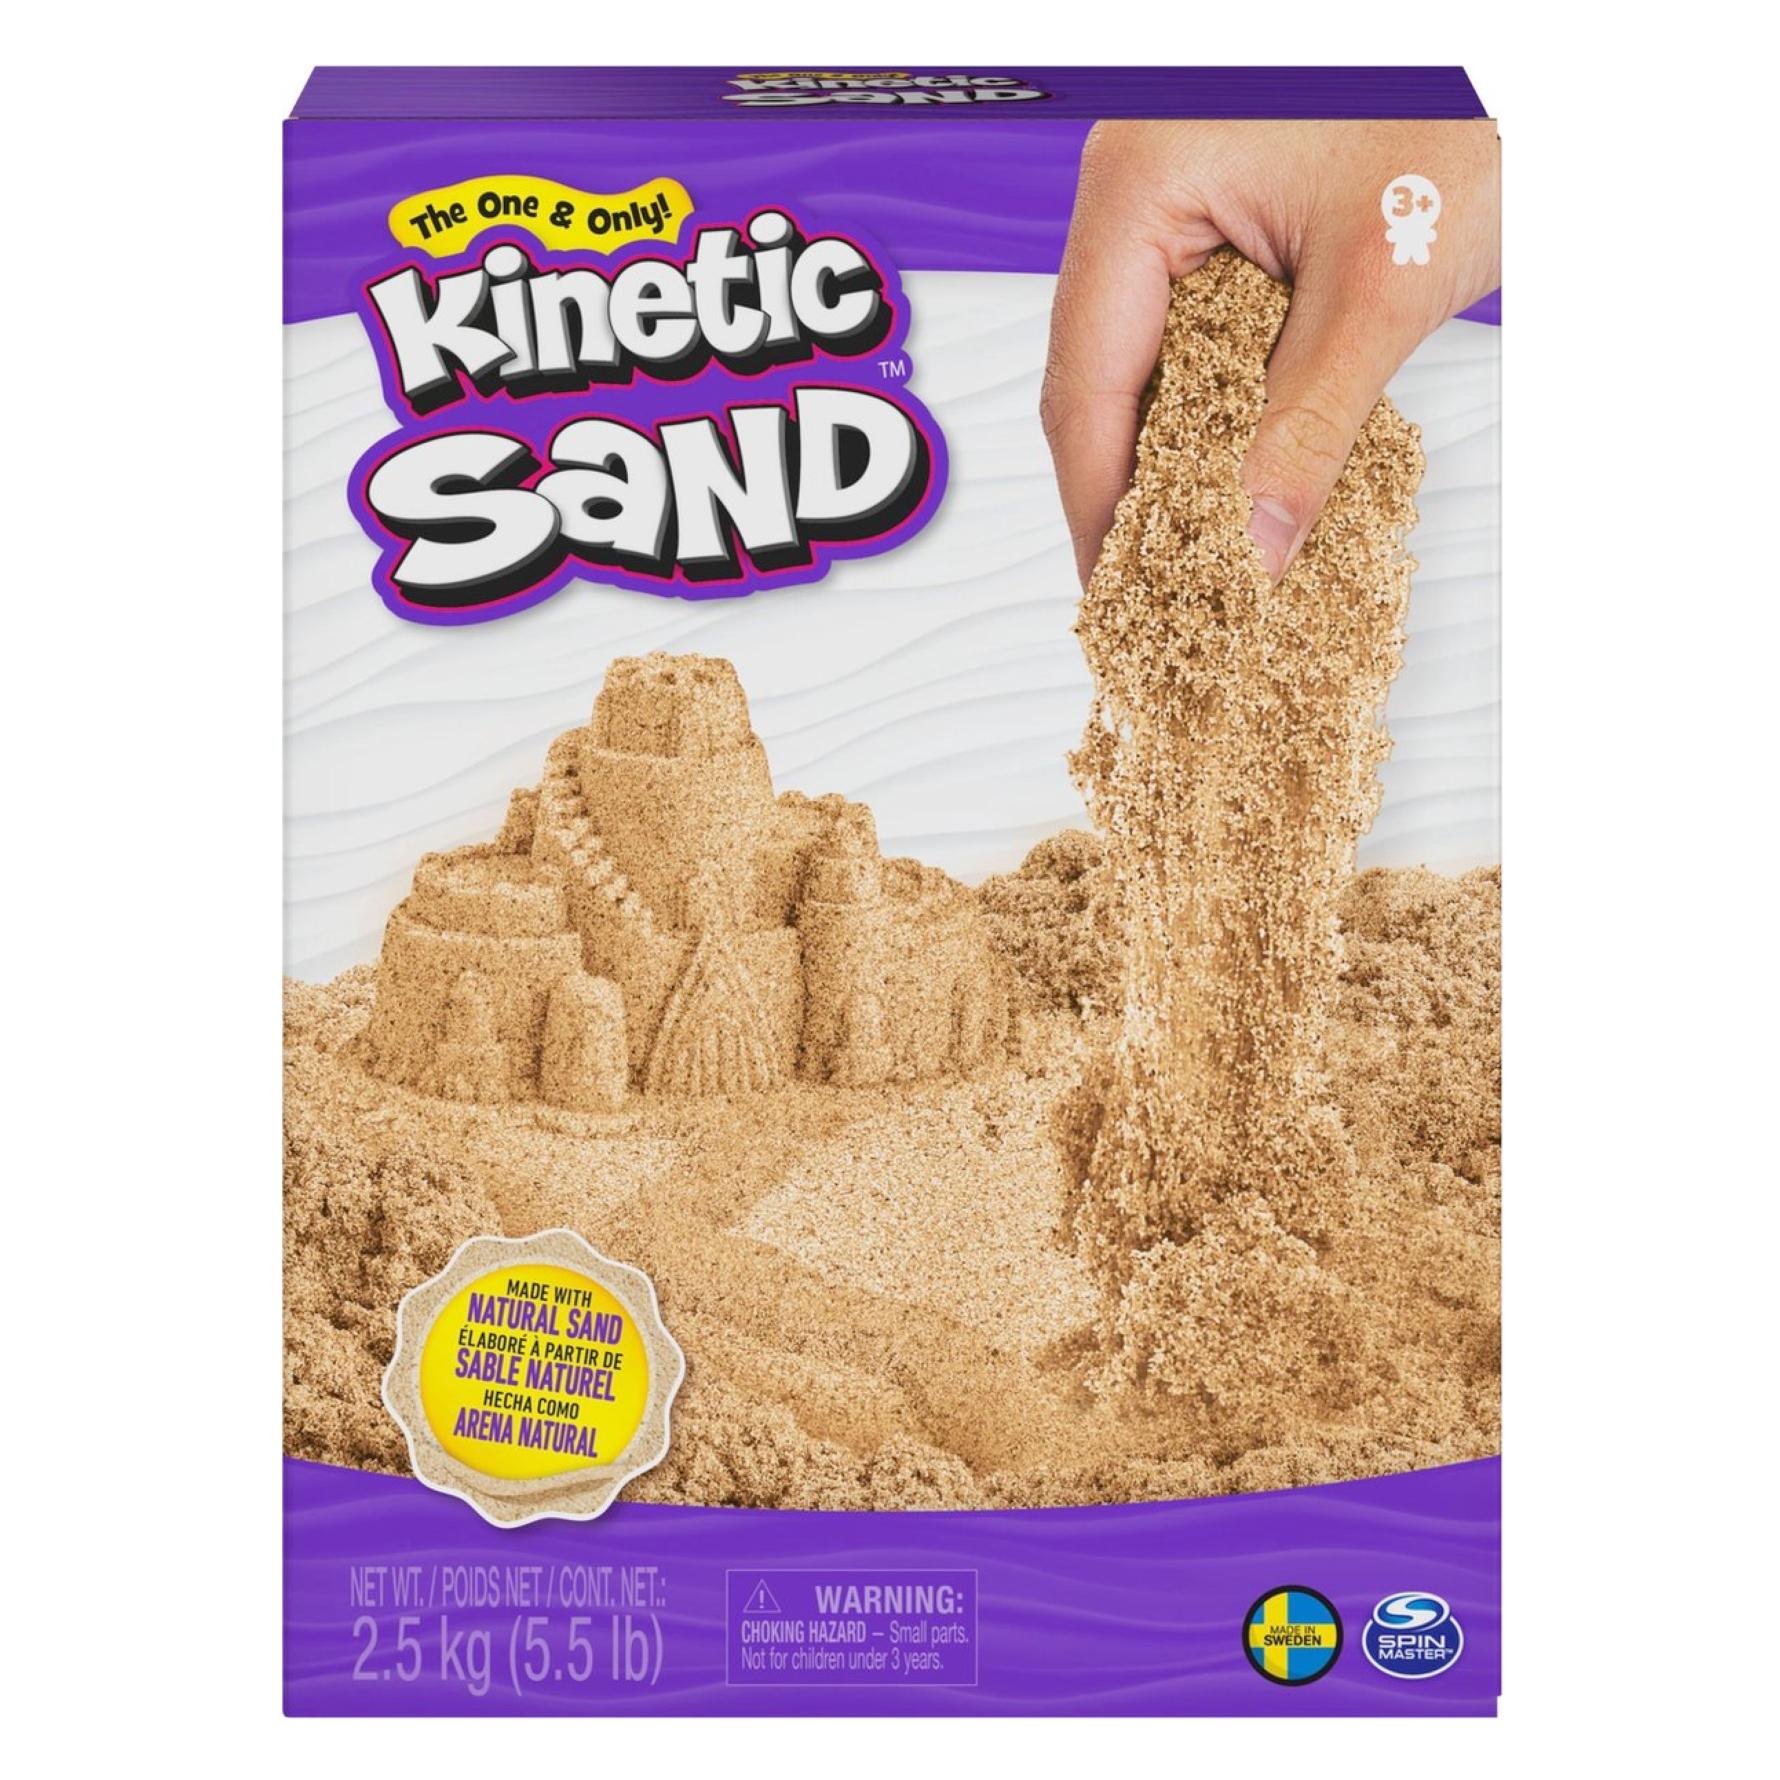 Speelzand - Kinetisch zand - 2,5kg